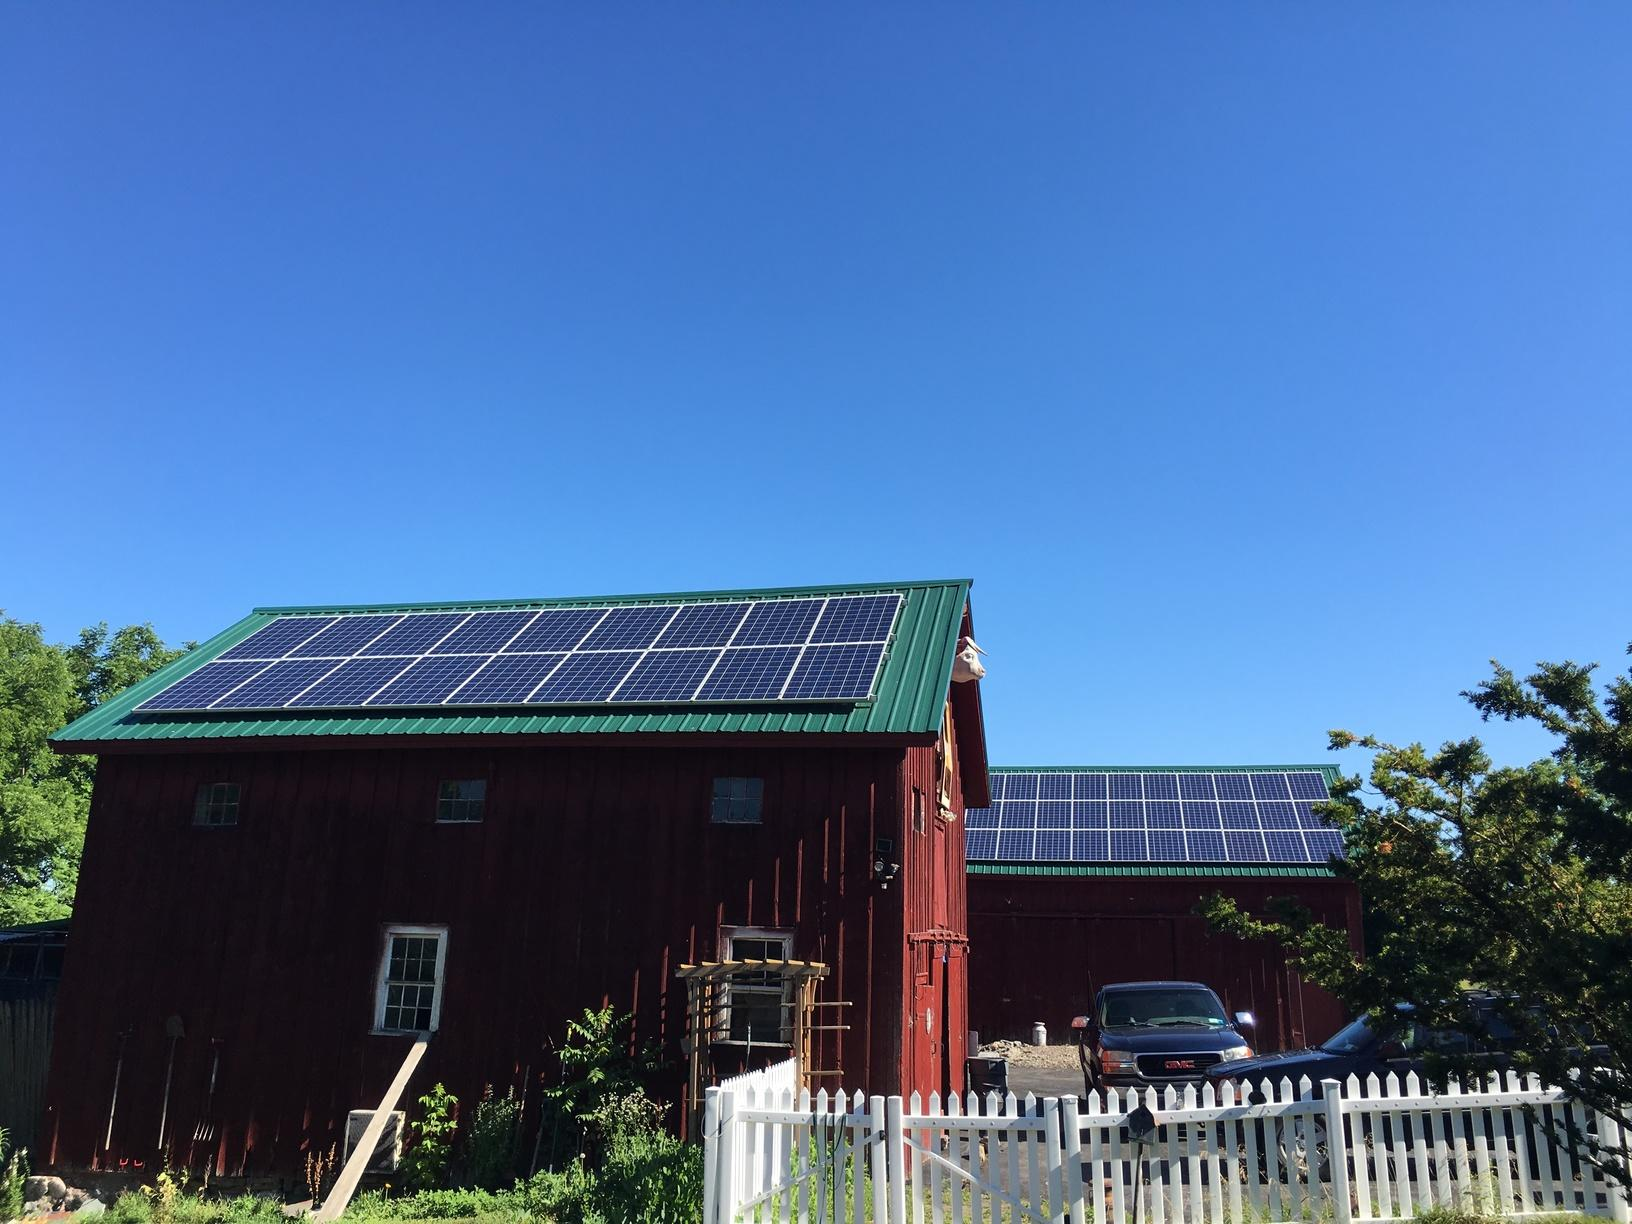 Solar Installation in Auburn, NY - After Photo